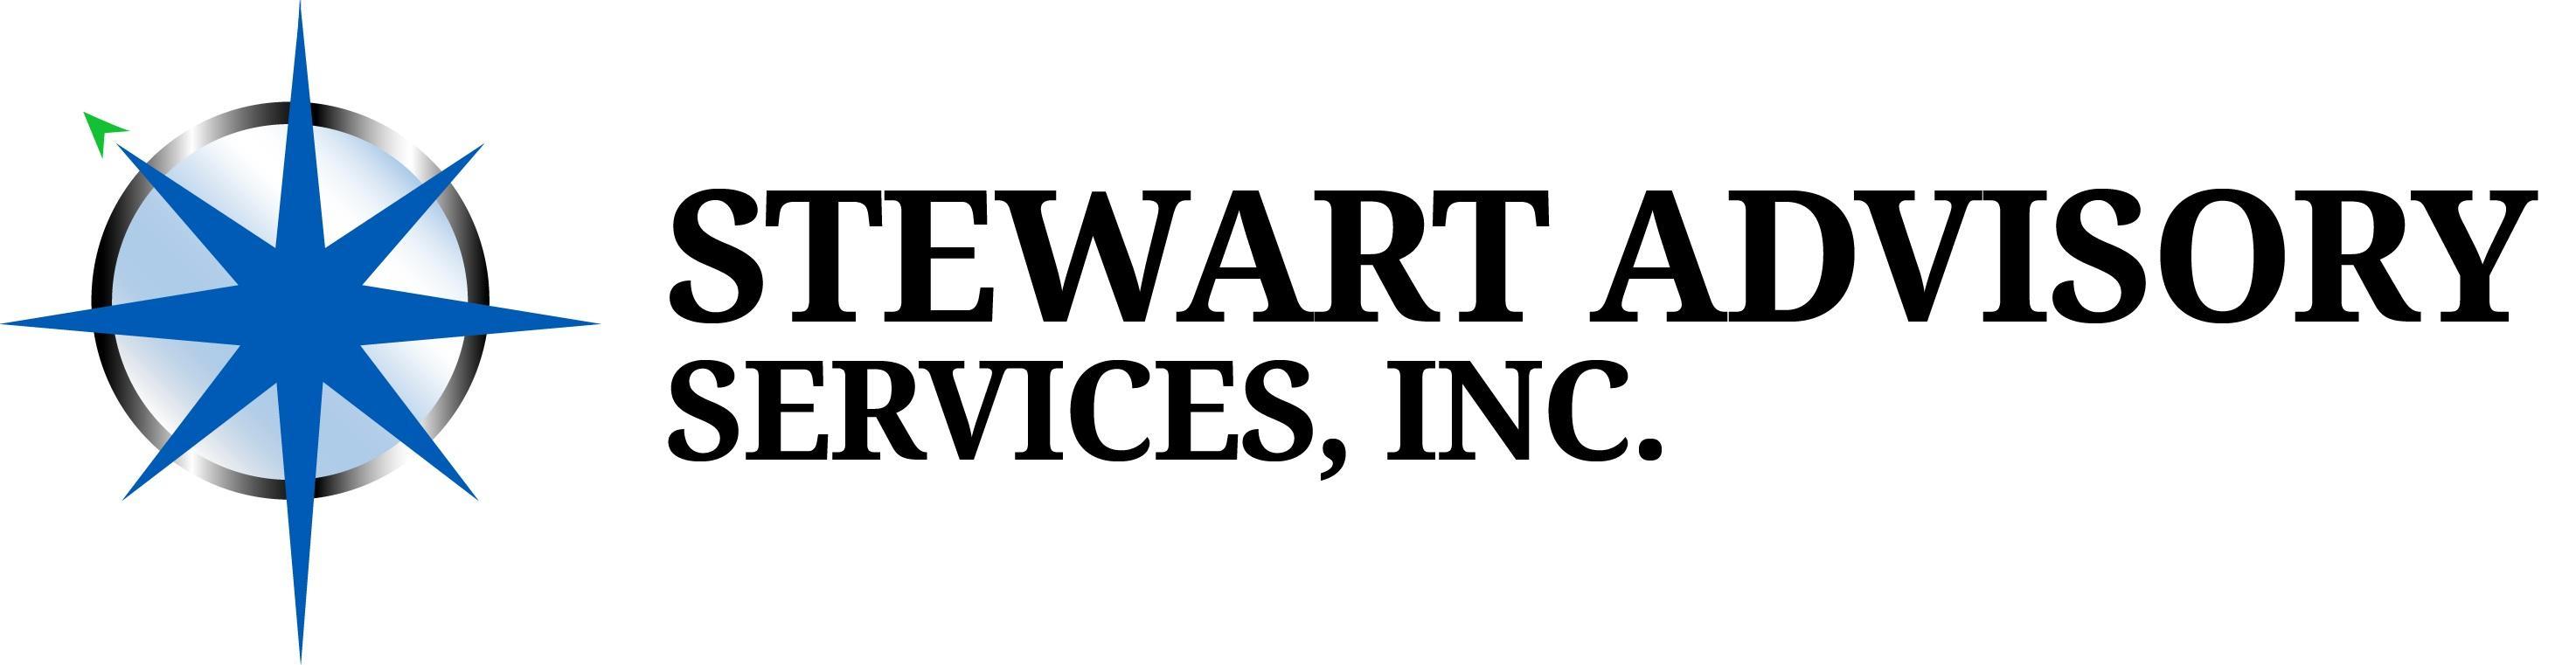 Stewart Advisory Services, INC.